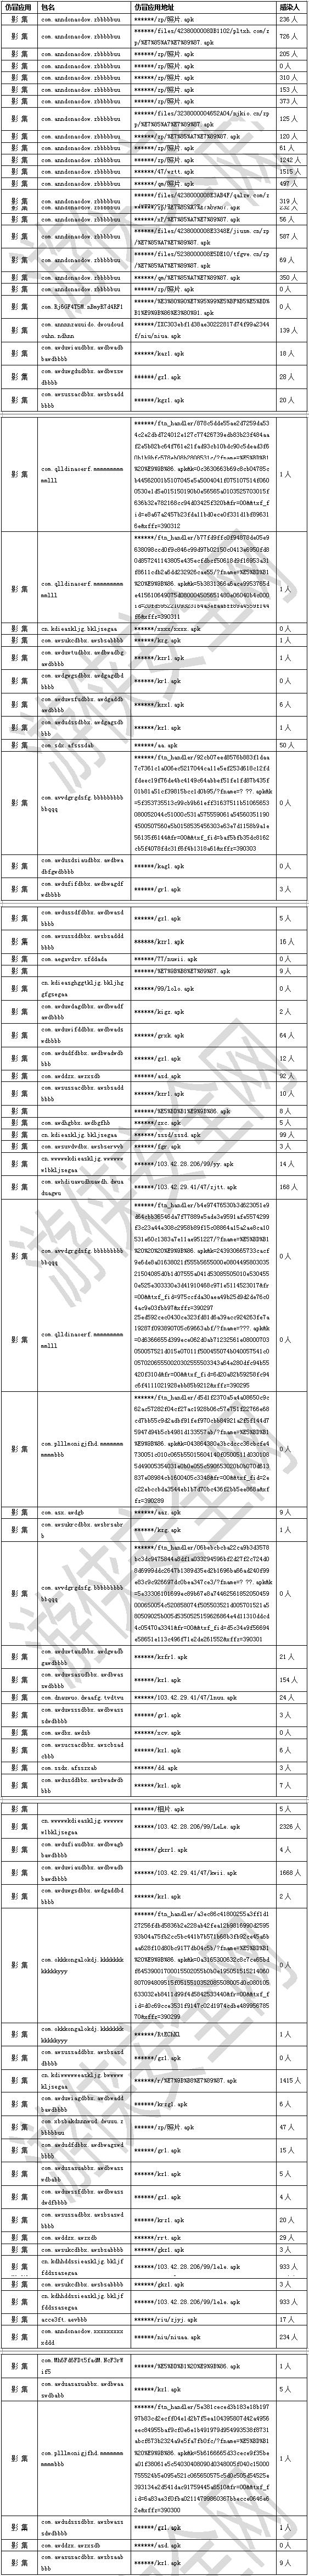 2016-08-22_121723